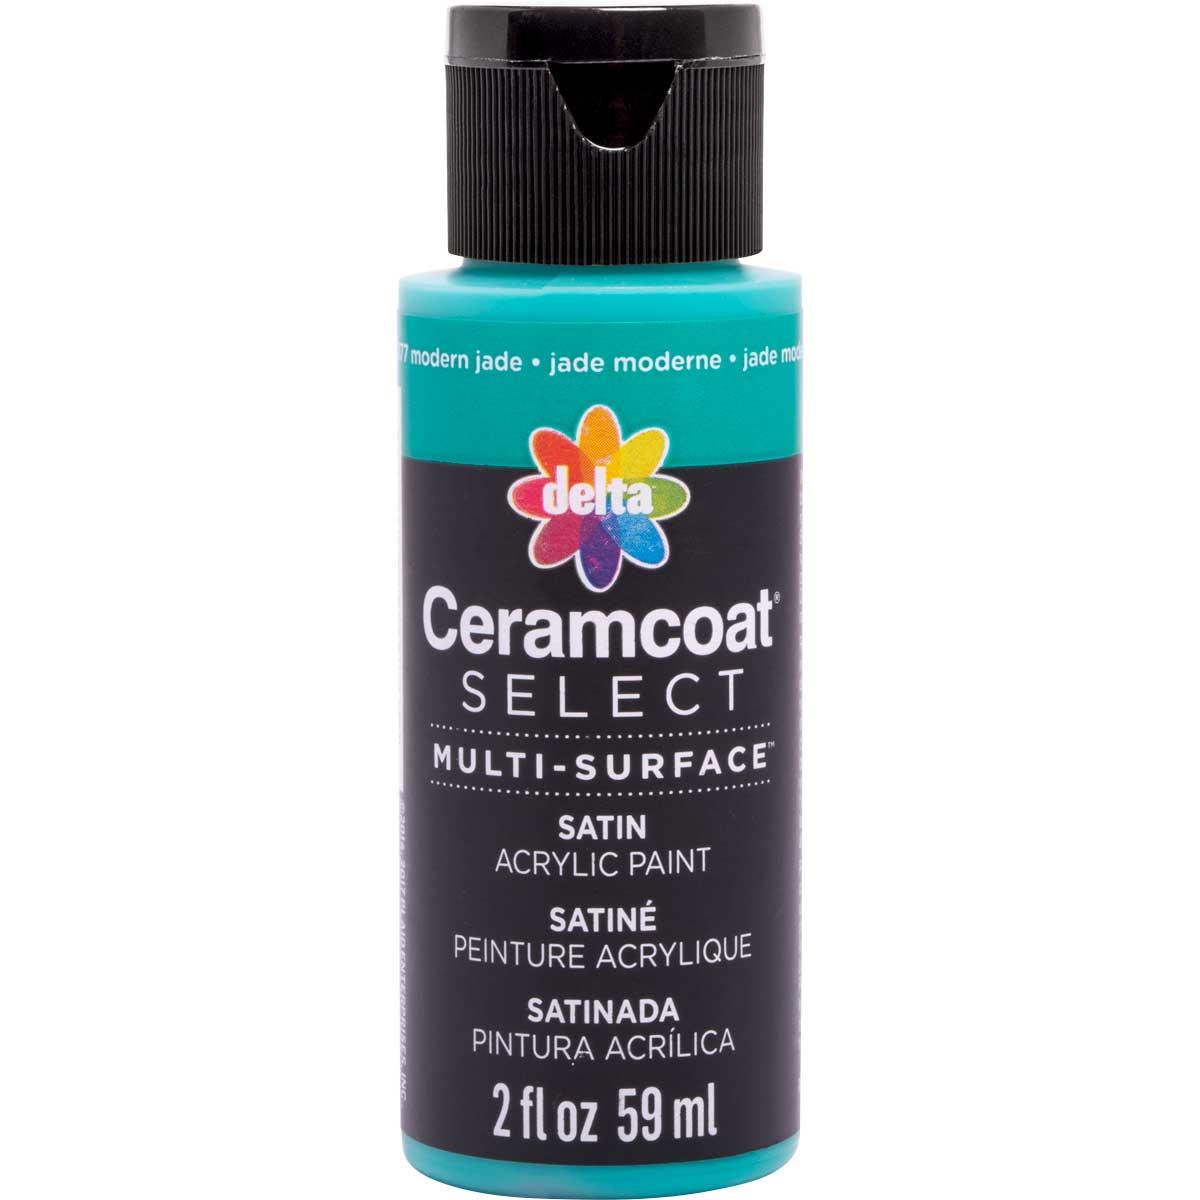 Delta Ceramcoat ® Select Multi-Surface Acrylic Paint - Satin - Modern Jade, 2 oz. - 04077